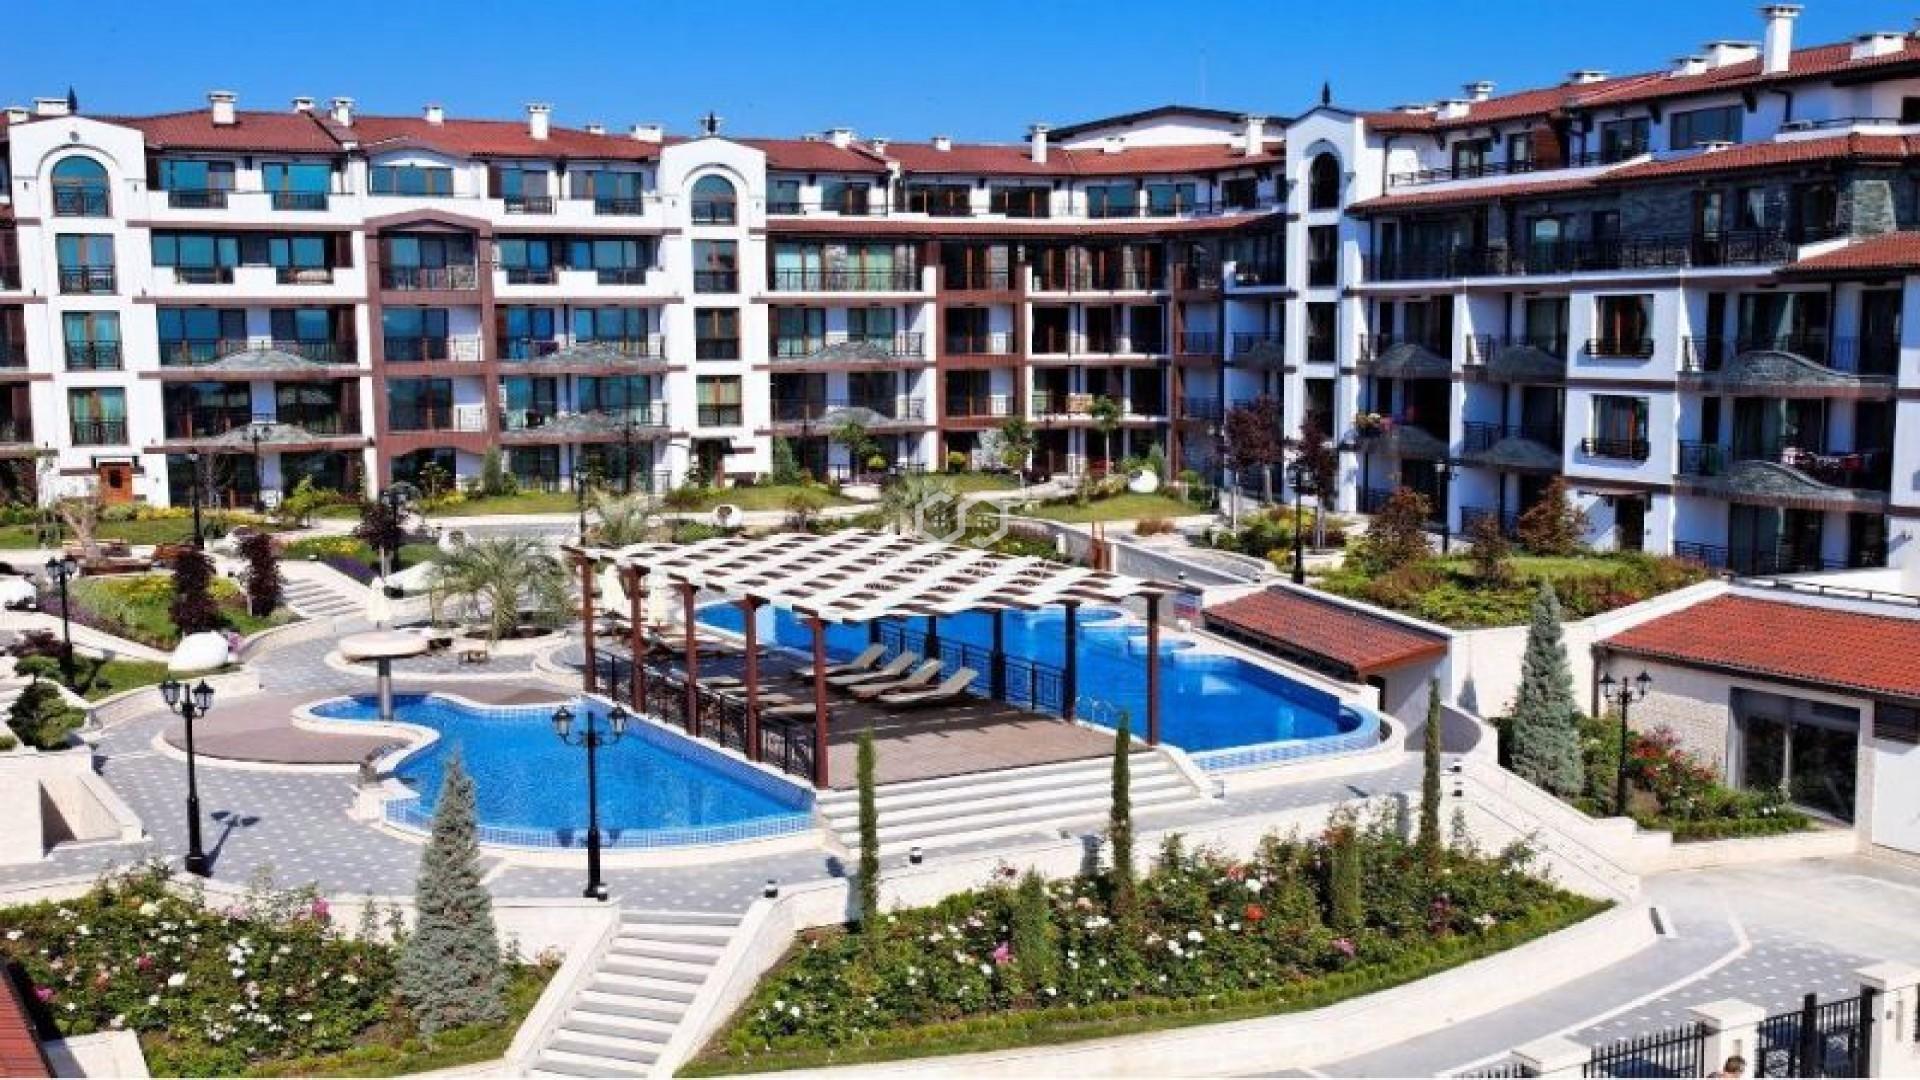 Tристаен апартамент Поморие 120 m2